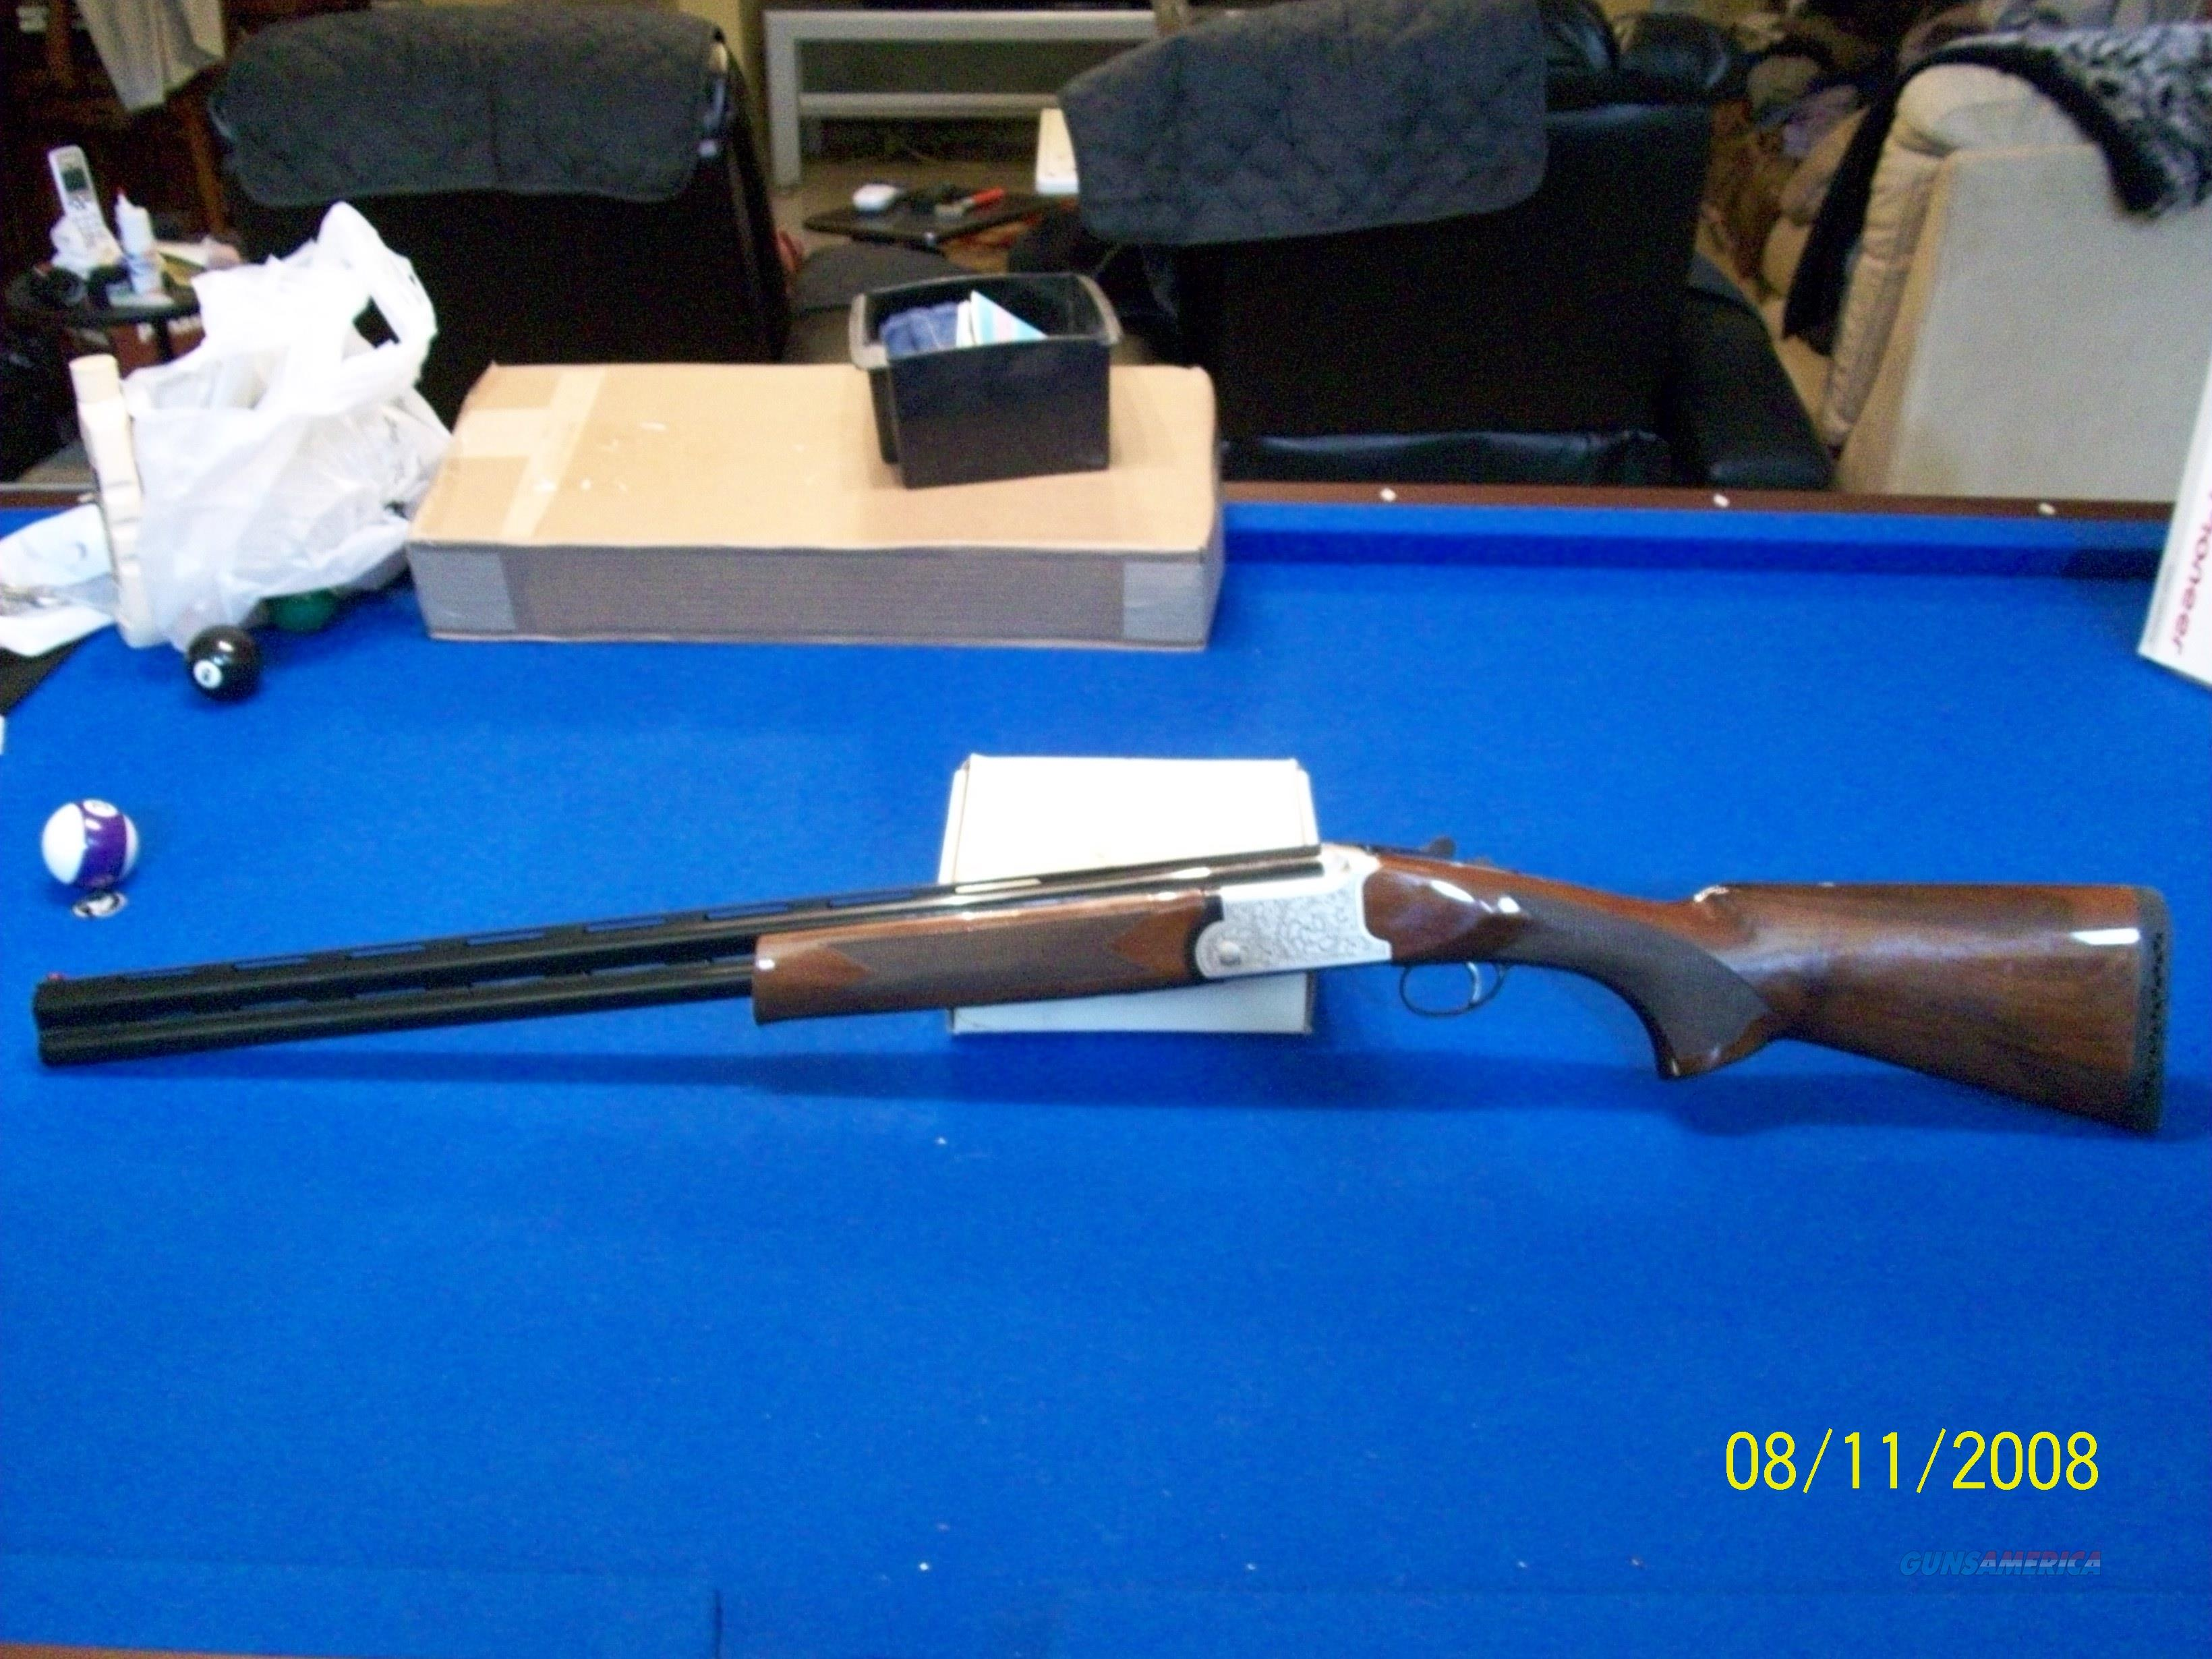 FOR SALE: Tristar 12ga O/U Shotgun  Guns > Shotguns > Tristar Shotguns